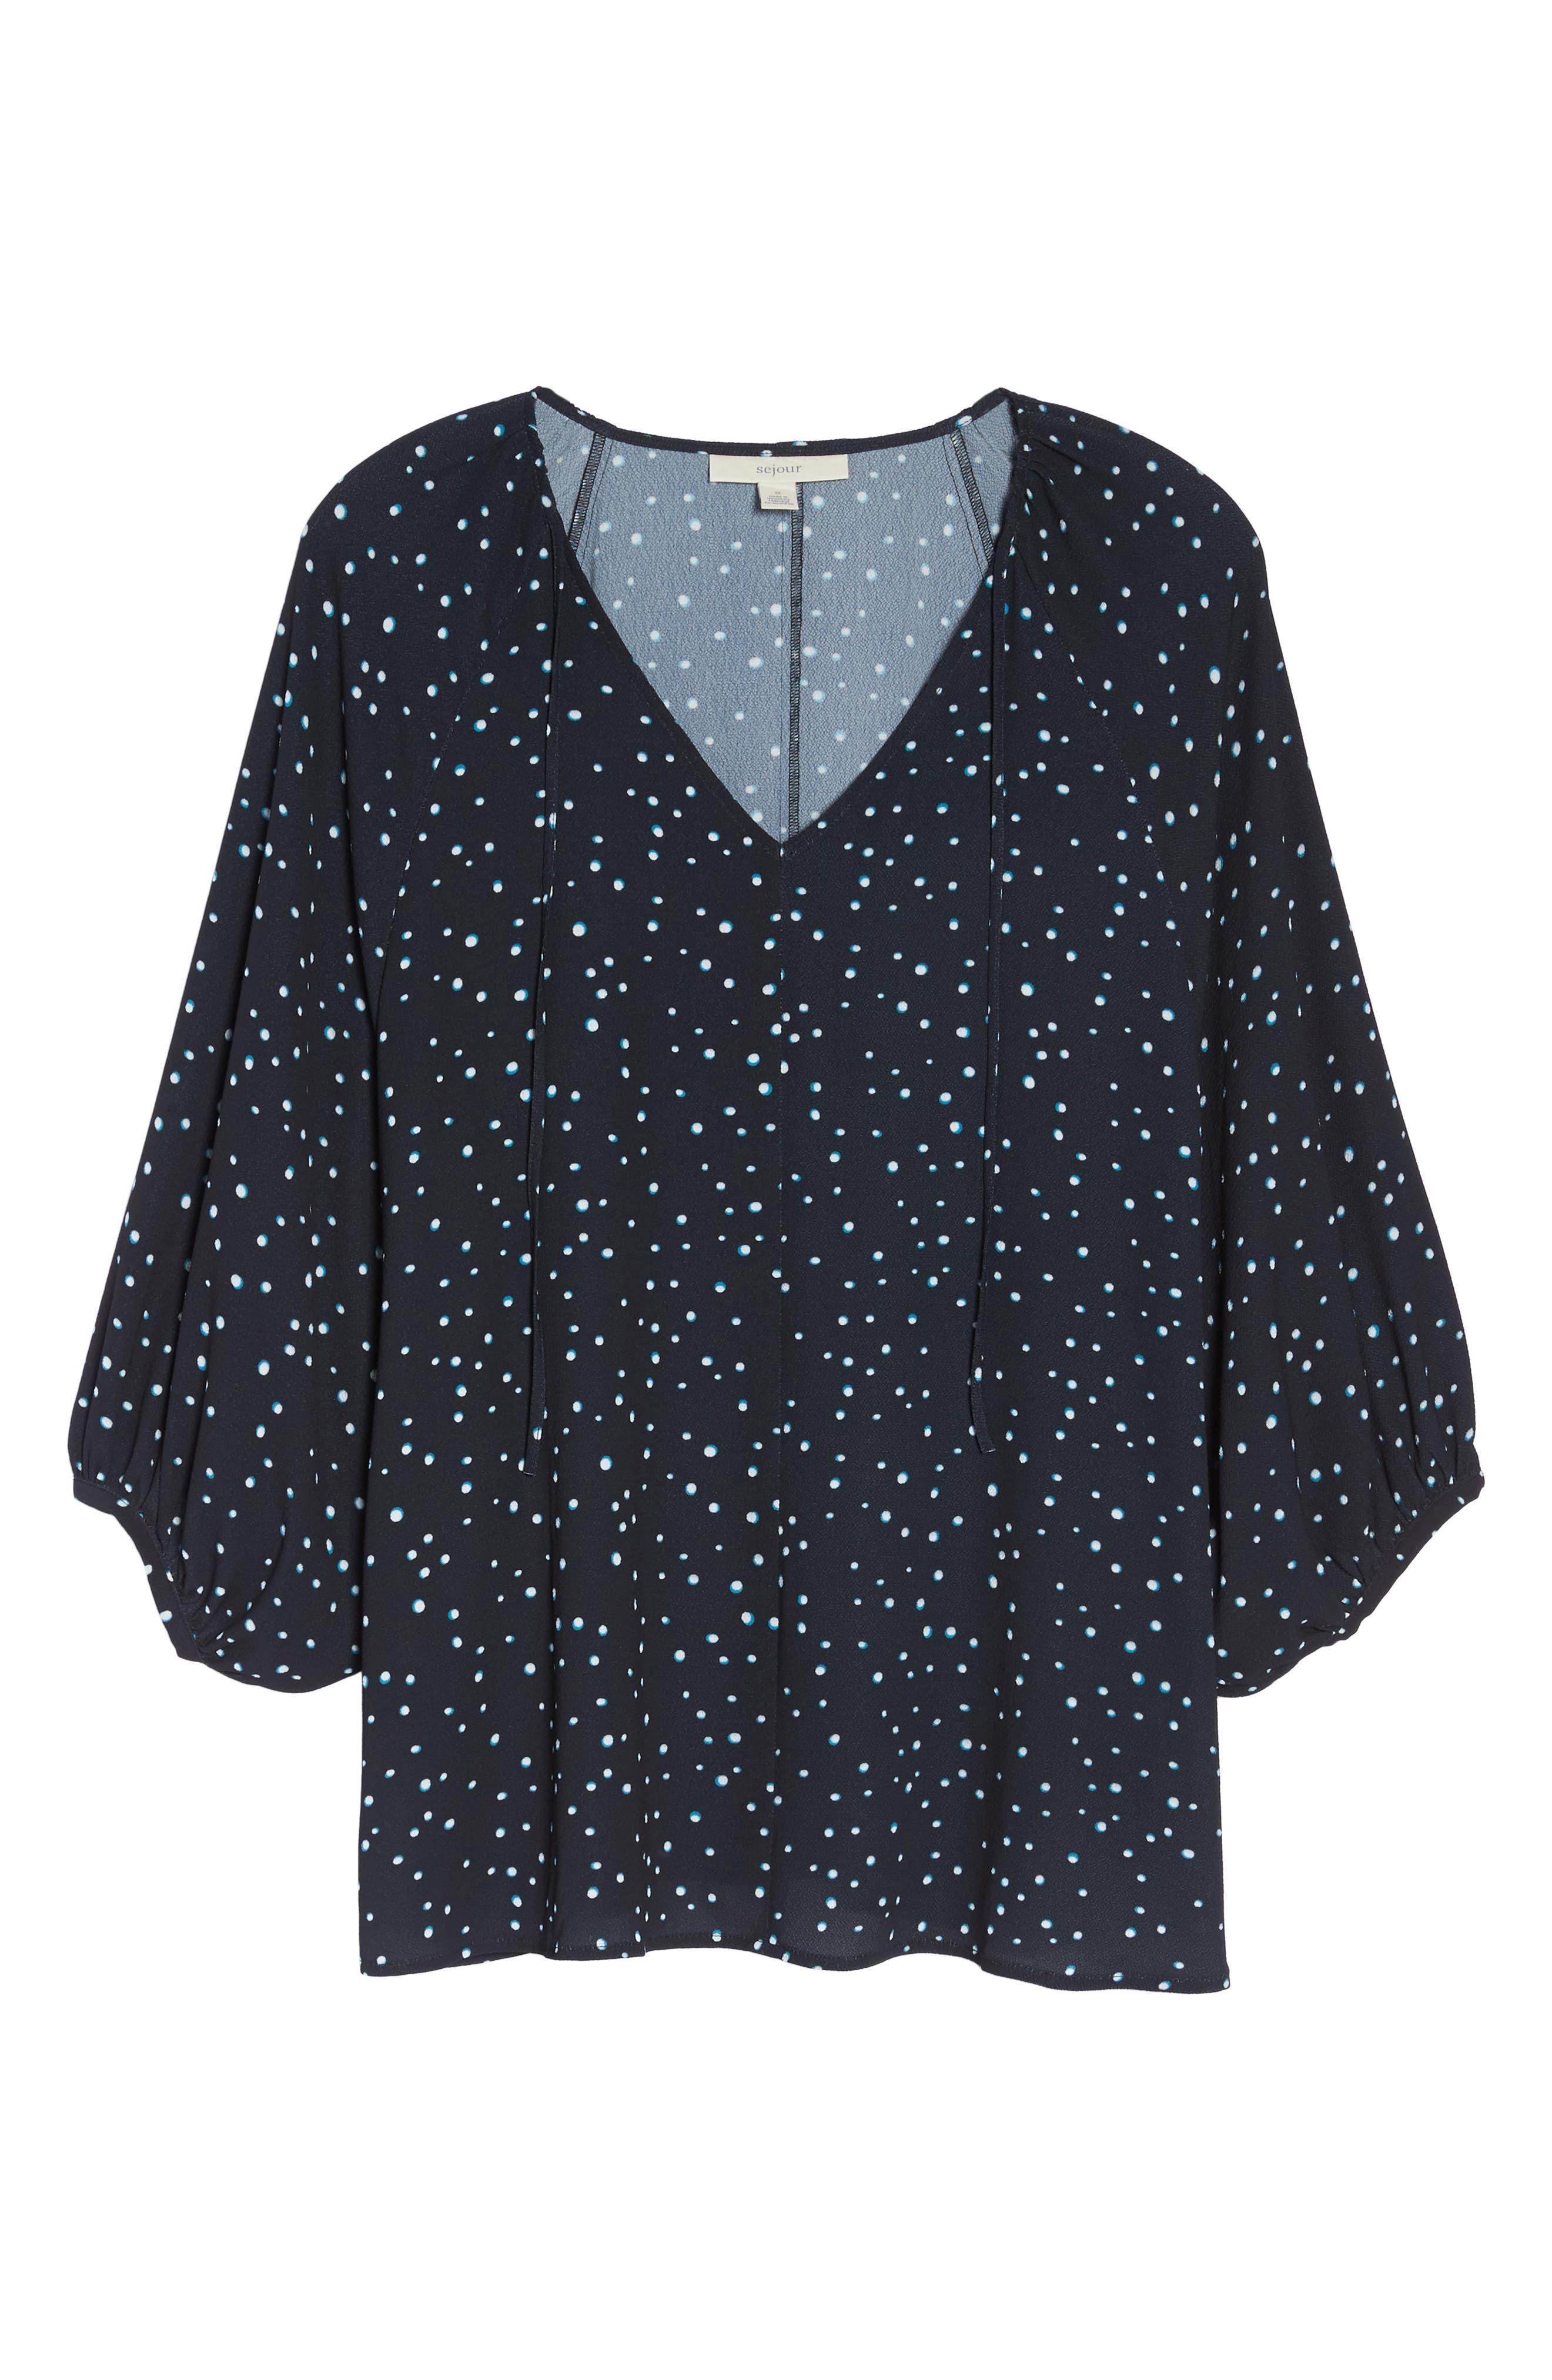 Batwing Top,                             Alternate thumbnail 6, color,                             BLACK- BLUE SHADOW DOT PRINT